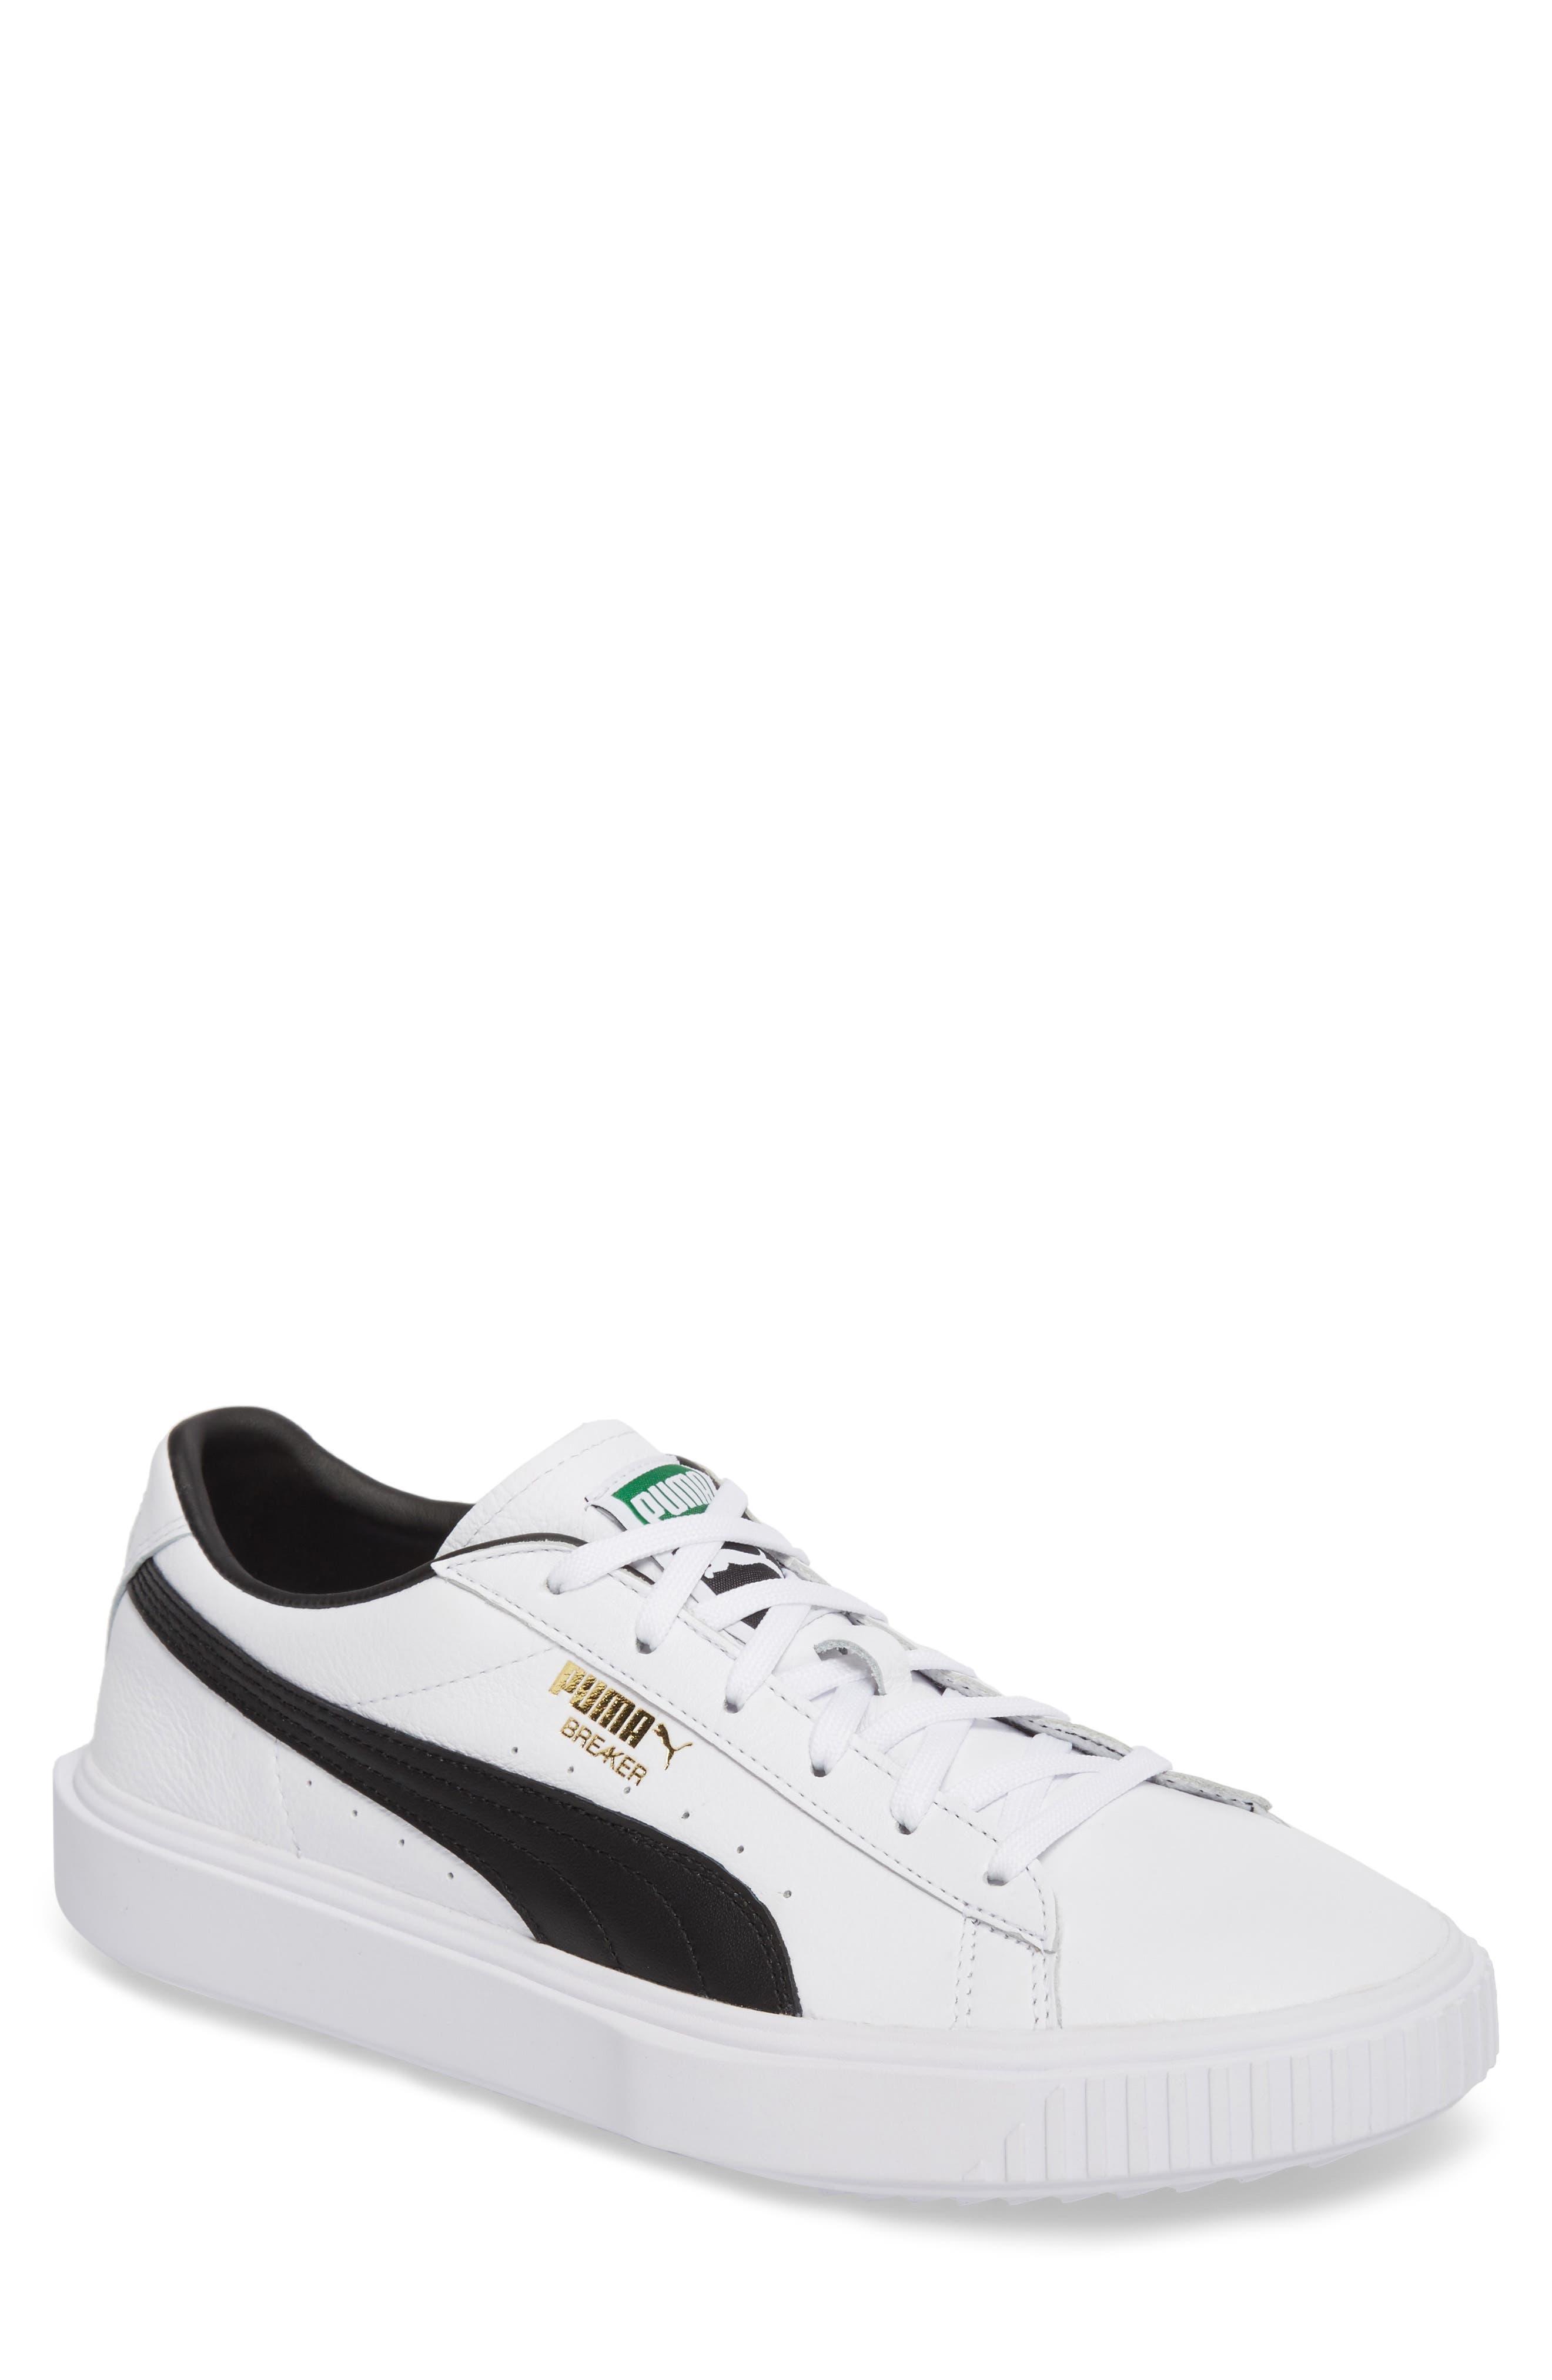 Breaker Low Top Sneaker,                             Main thumbnail 1, color,                             WHITE/ BLACK LEATHER